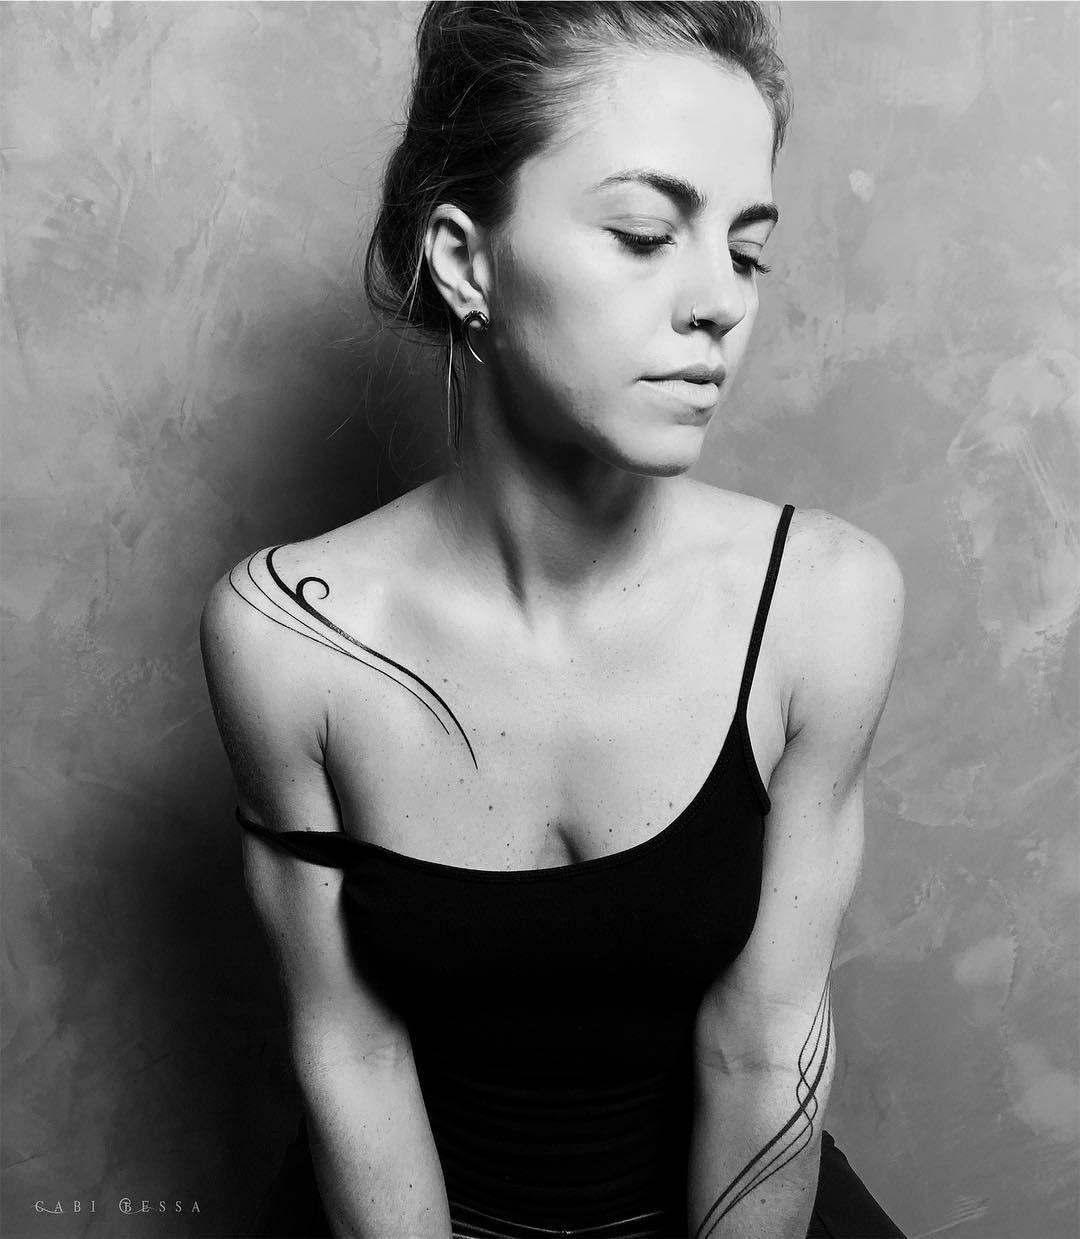 "Photo of Gabi Bessa TATTOO on Instagram: ""🖤 She with all her beauty !!! @bkblife_explorer #gabibessa #tattoo #tattoo #tattoofeminine #inked #inkedgirls #body #art # minimalist… """